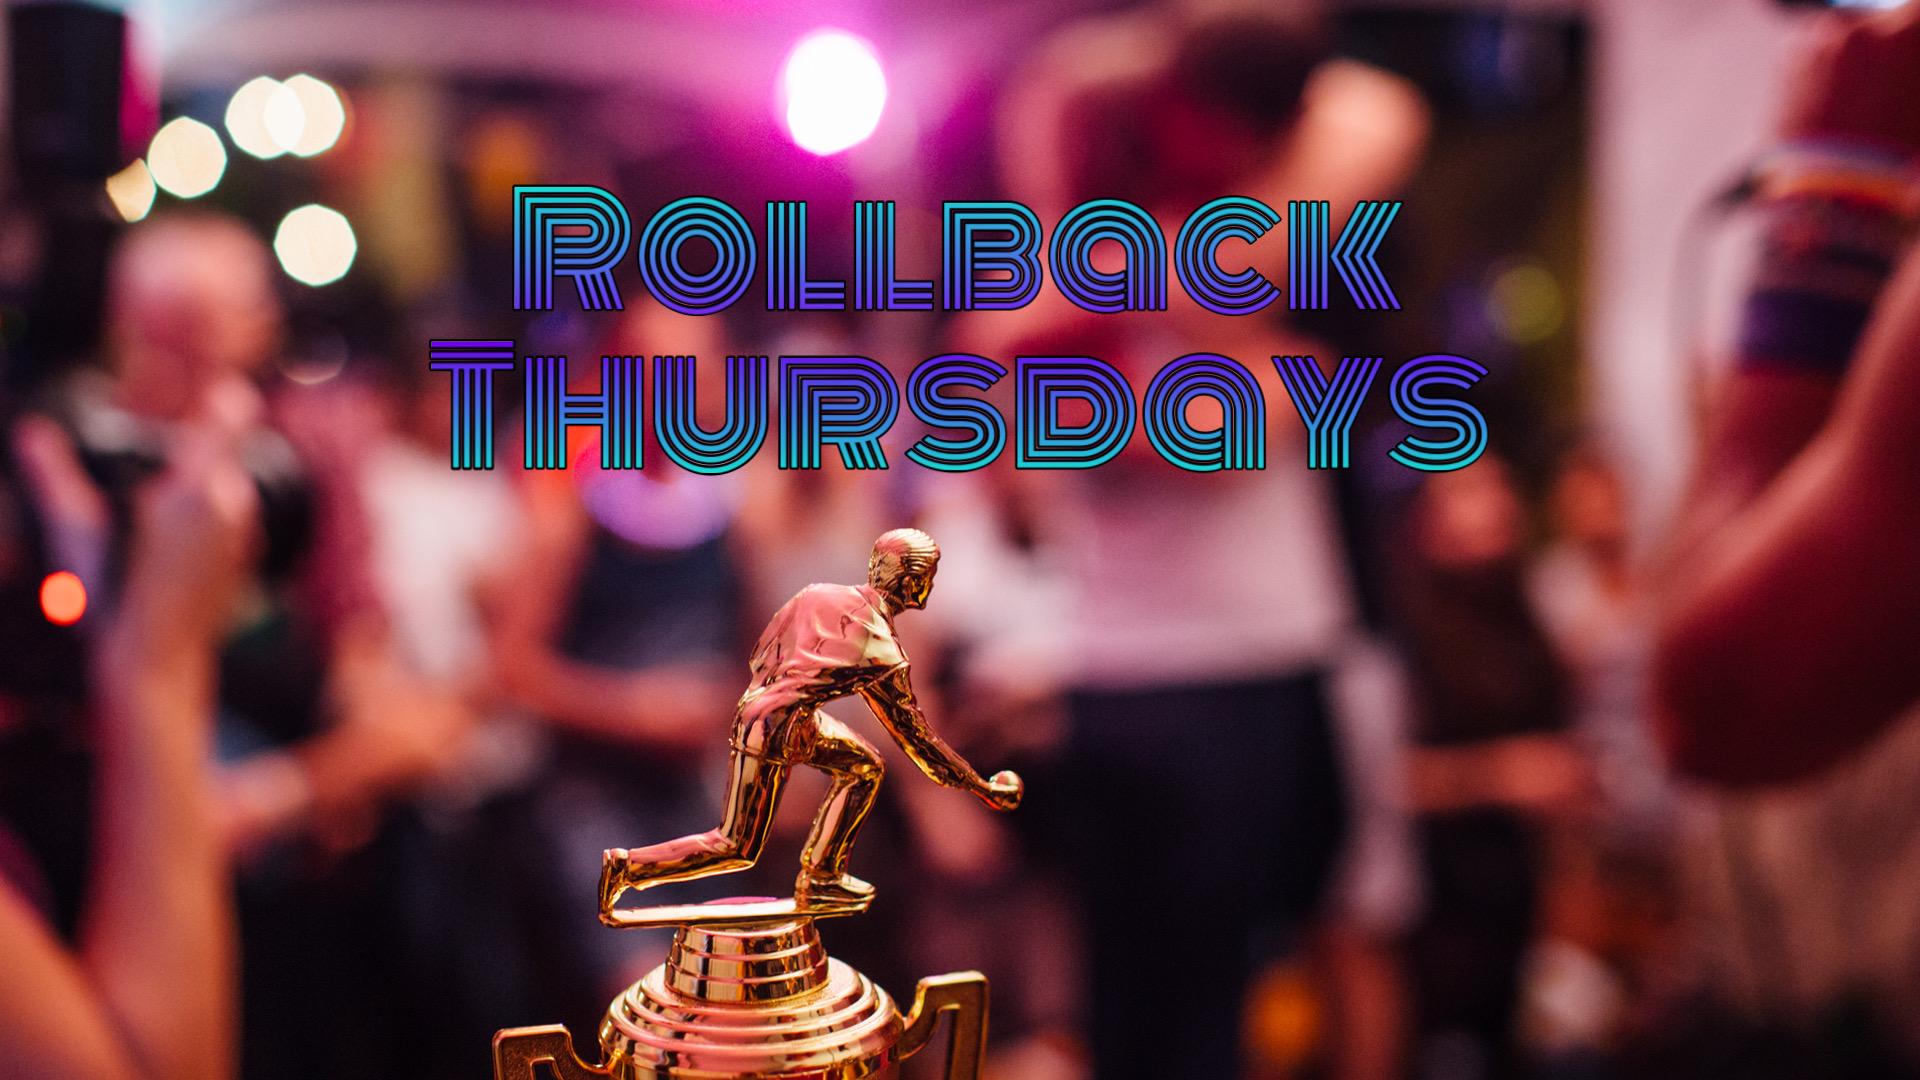 Rollback Thursday: 2012 Quarterfinal